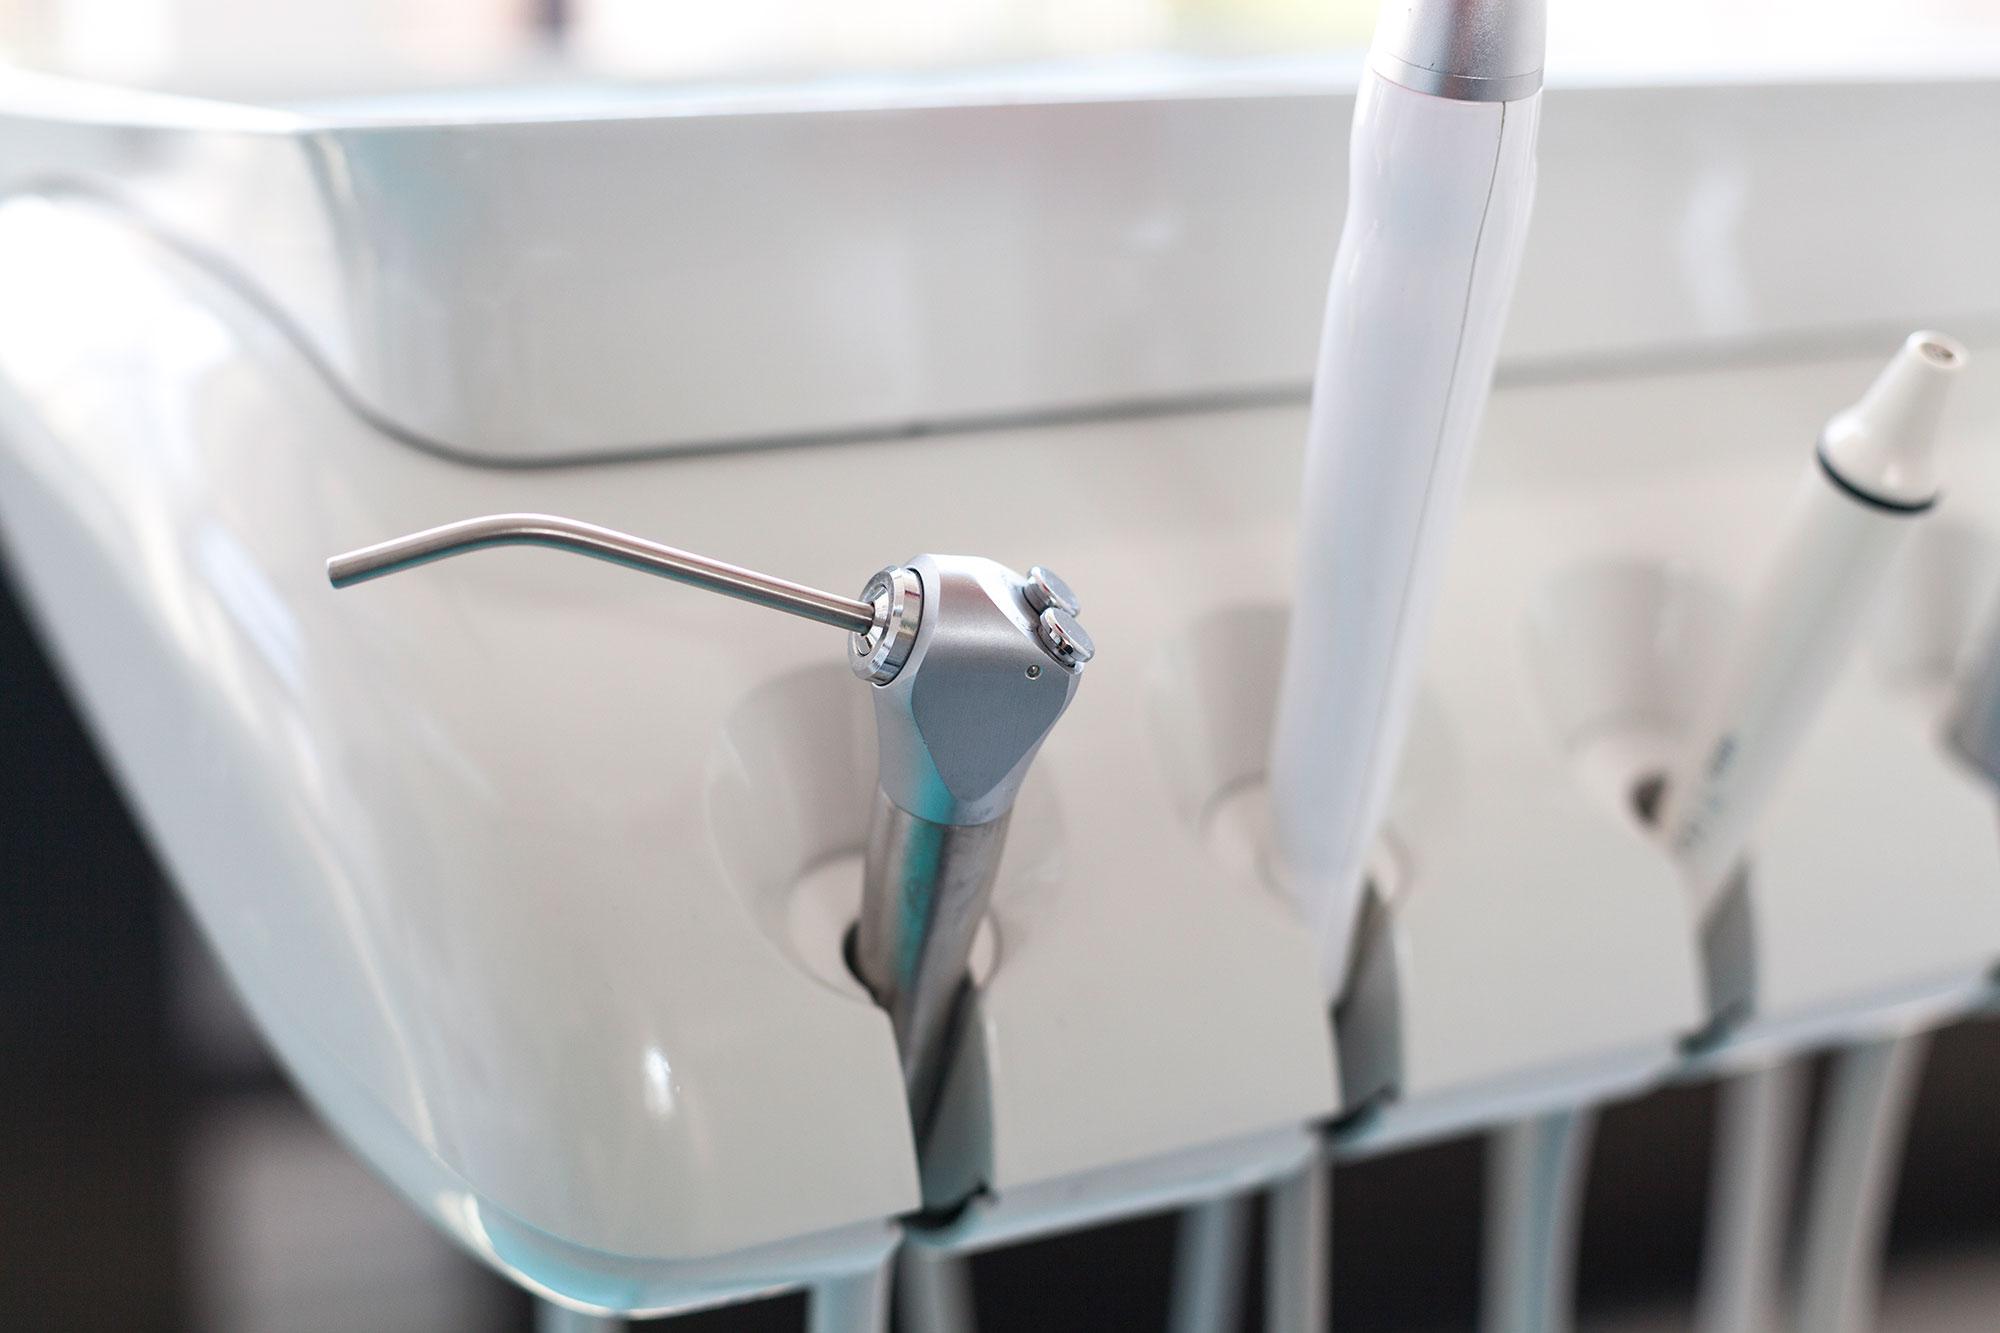 Clean denture tools